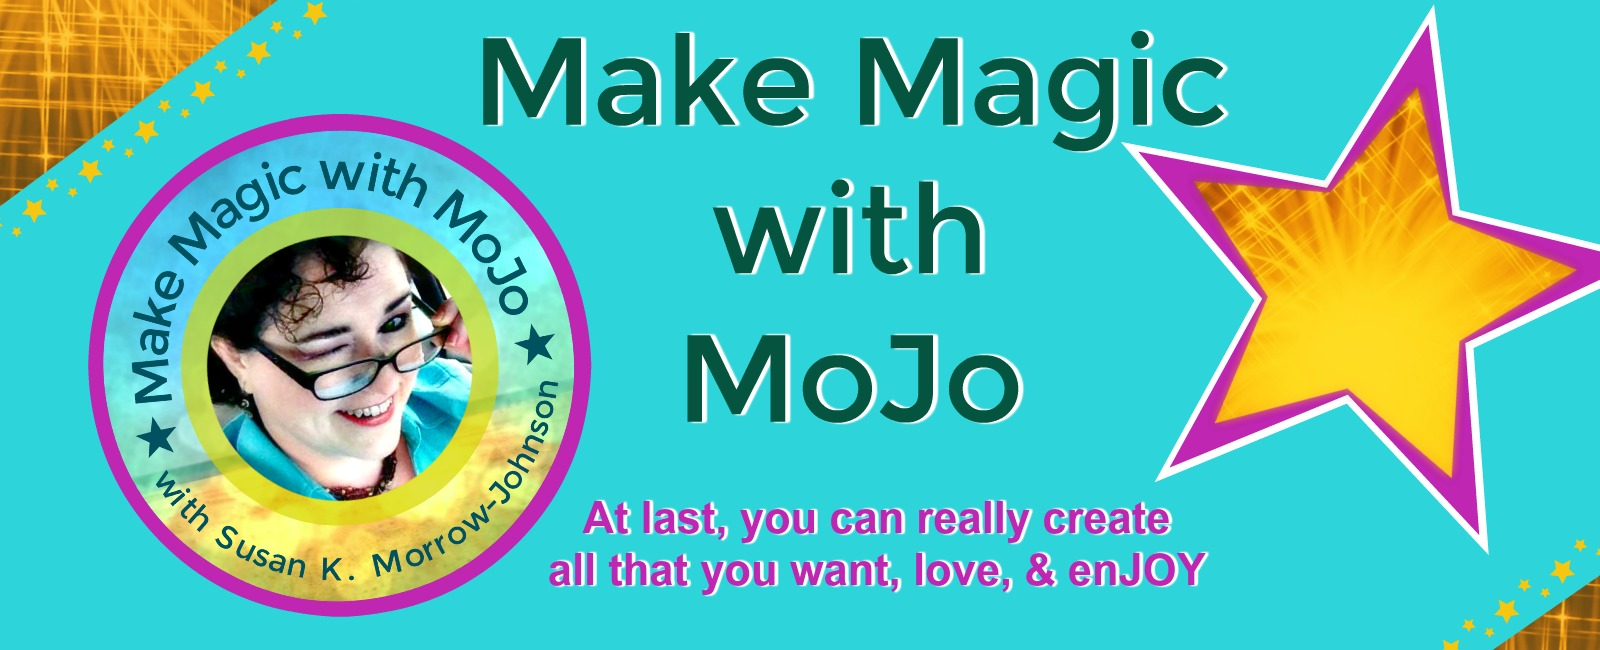 Make Magic with MoJo | MoJo Medium